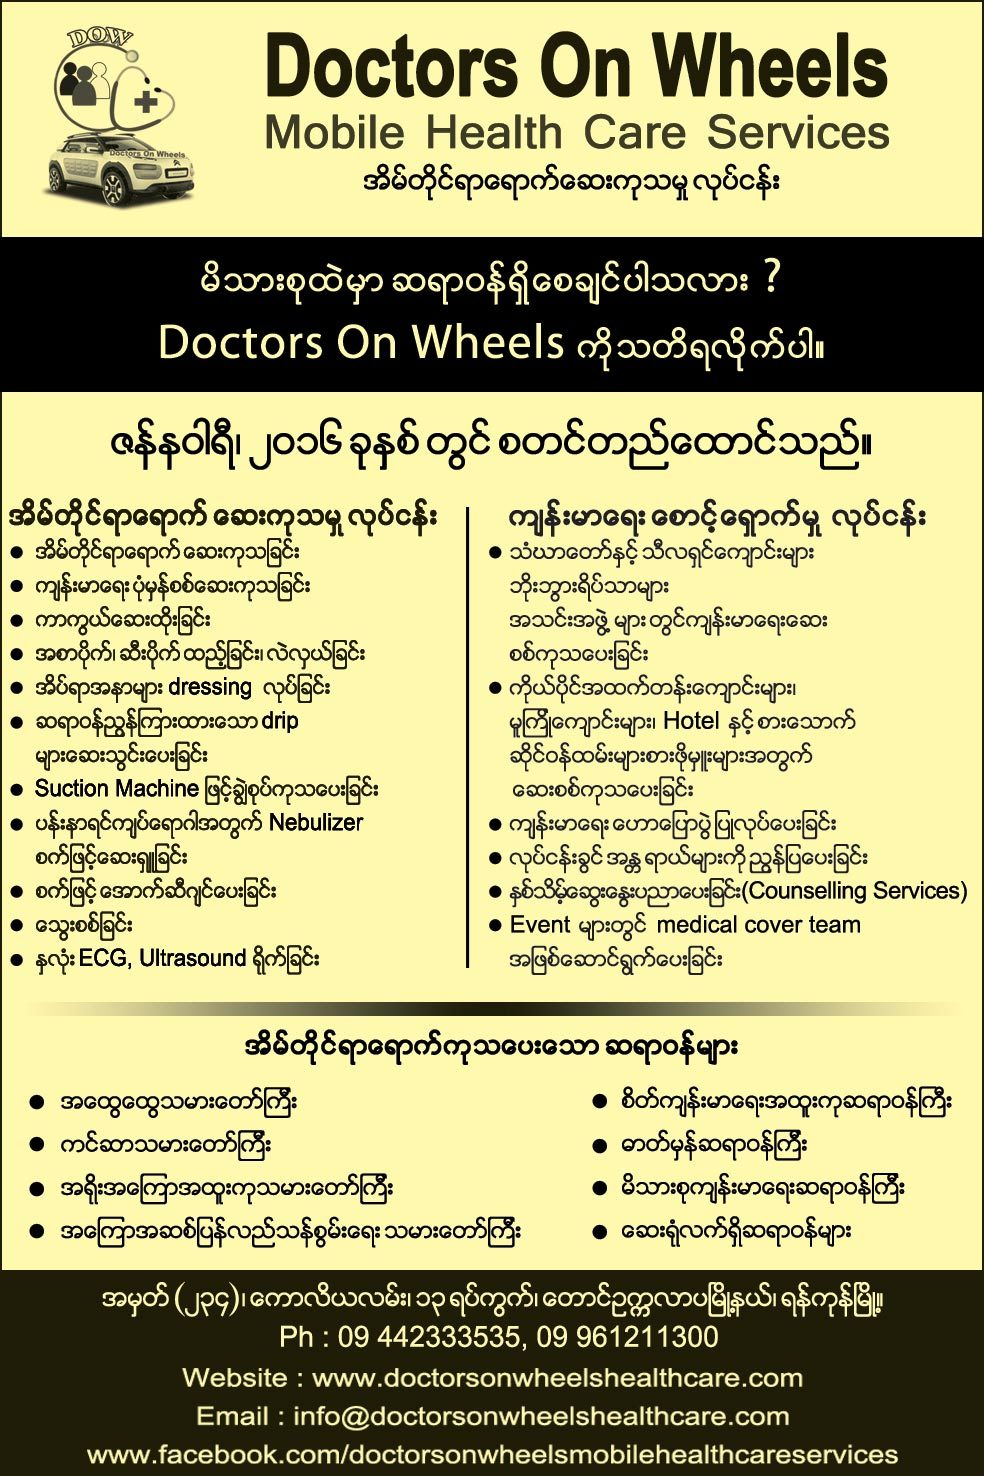 Doctors-On-Wheels_Clinics-(Private)_(C)_1372.jpg